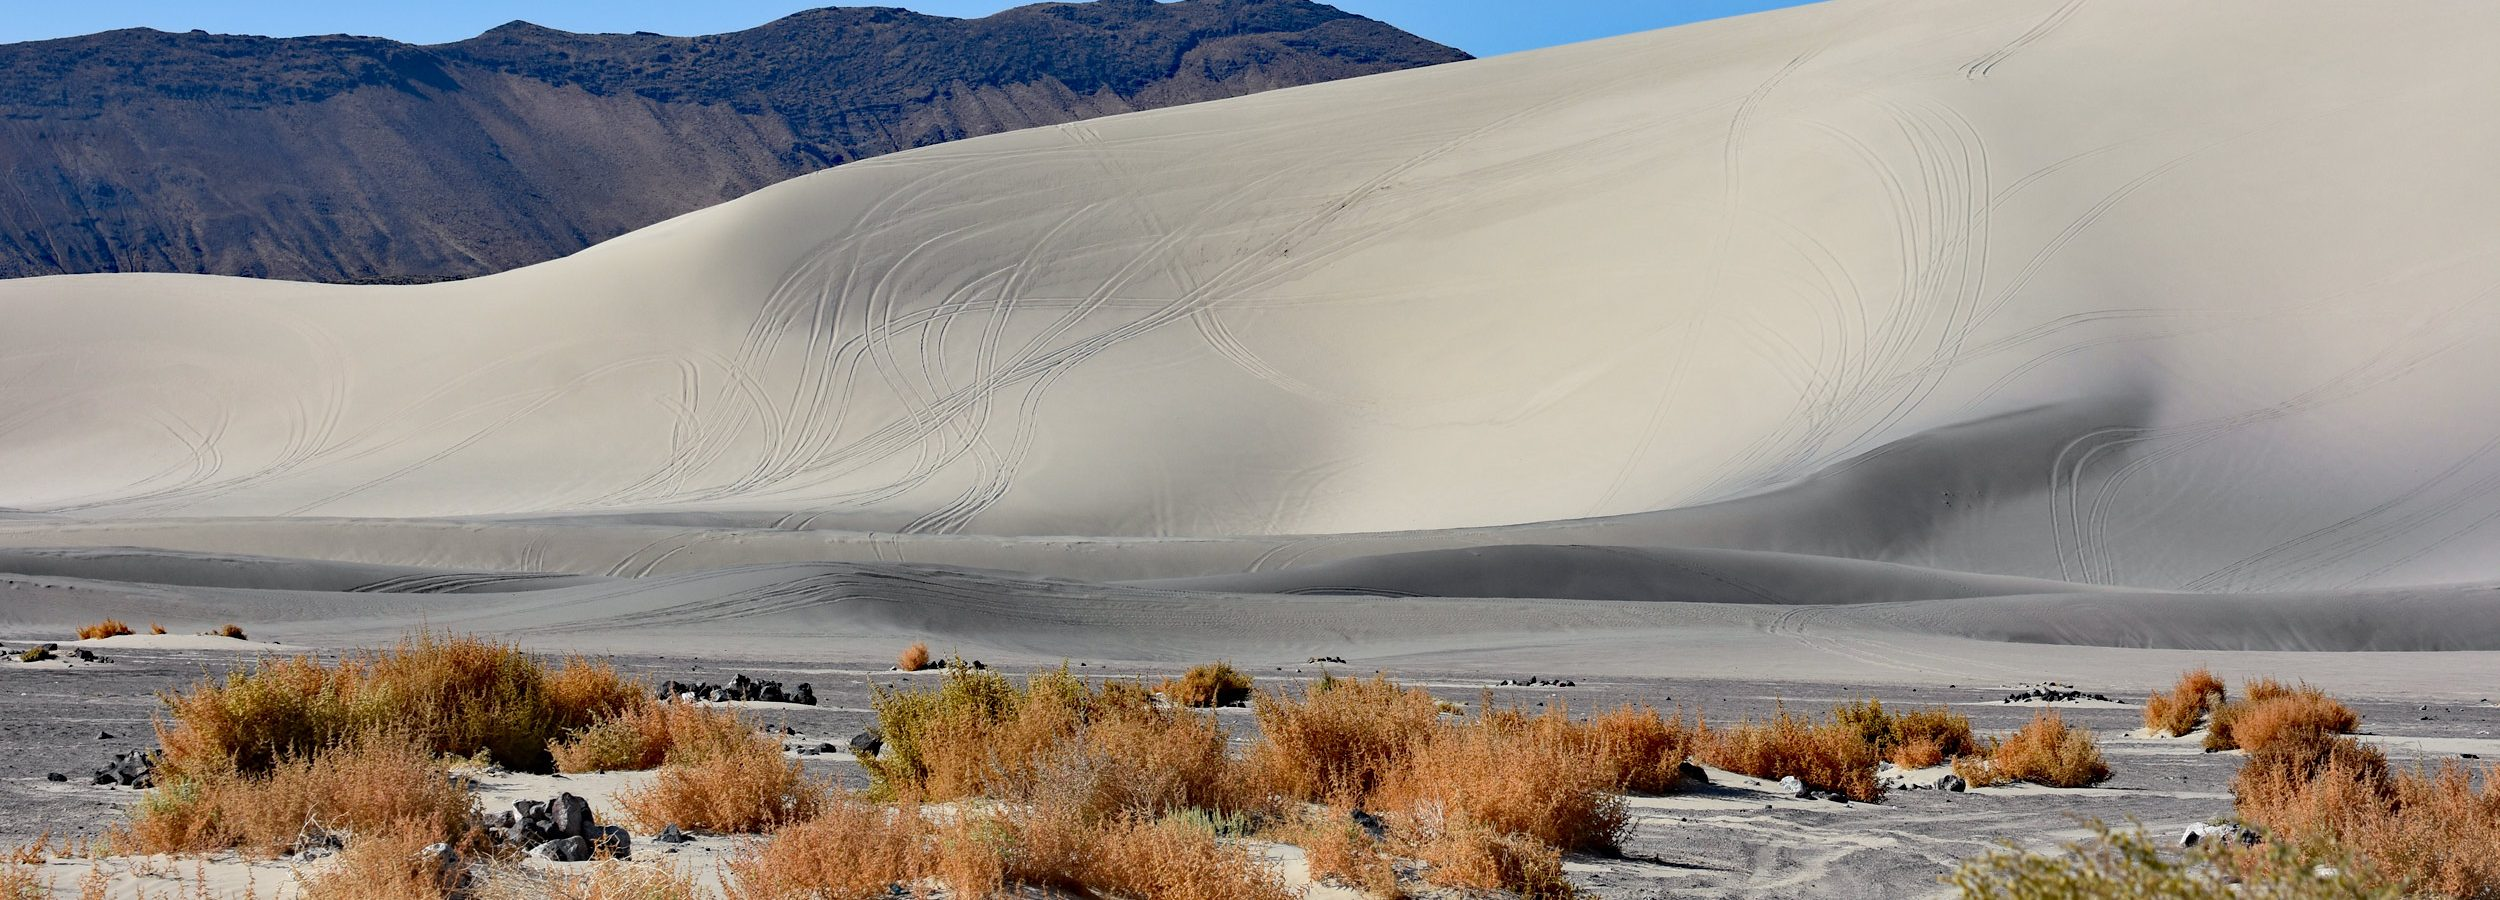 Sand Mountain, Nevada, USA